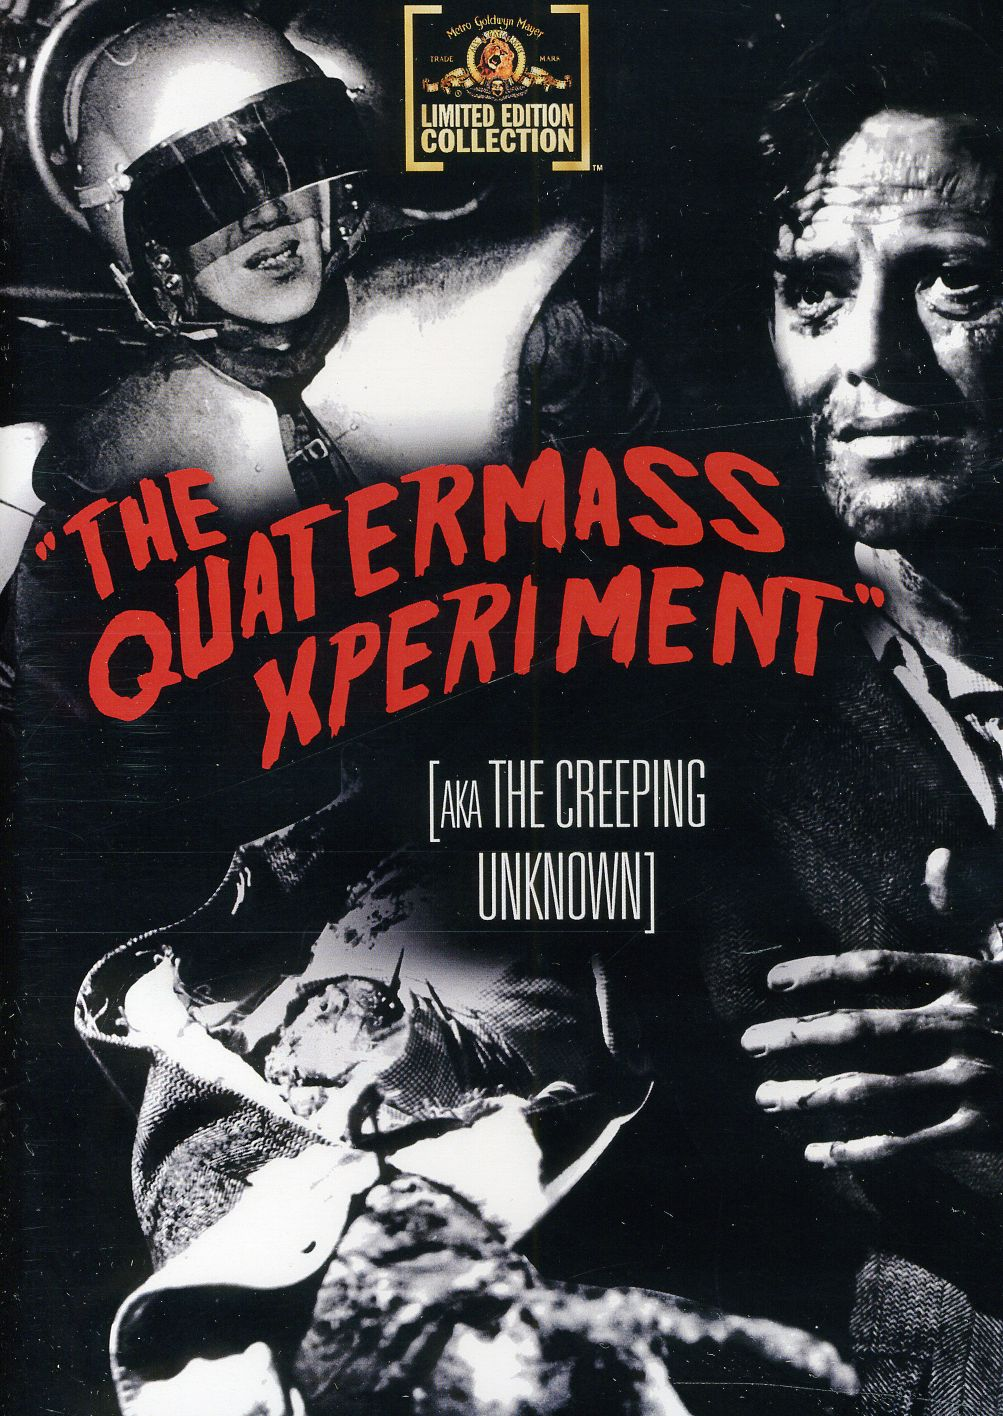 The Quatermass Xperiment (DVD)